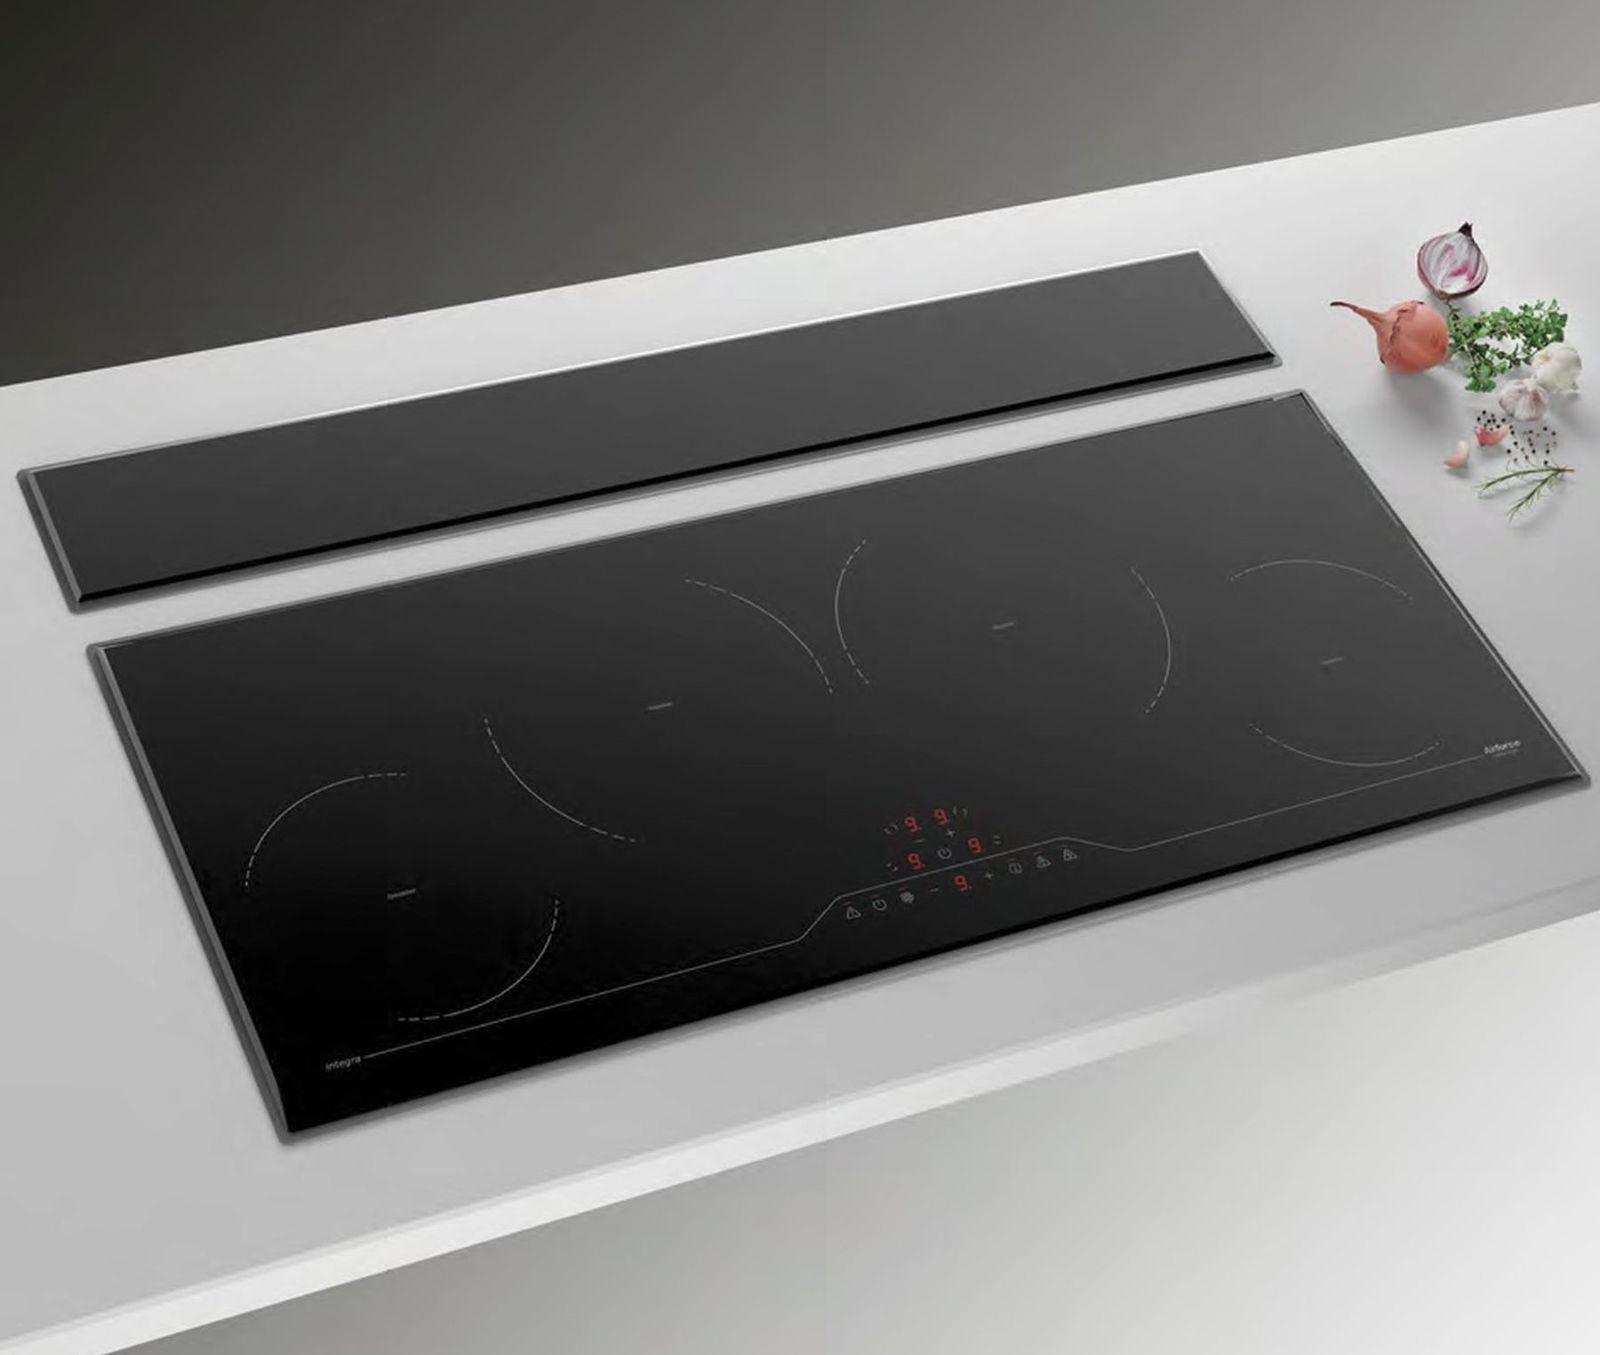 4 x glas induktions kochfeld timer edelstahl abzugshaube. Black Bedroom Furniture Sets. Home Design Ideas